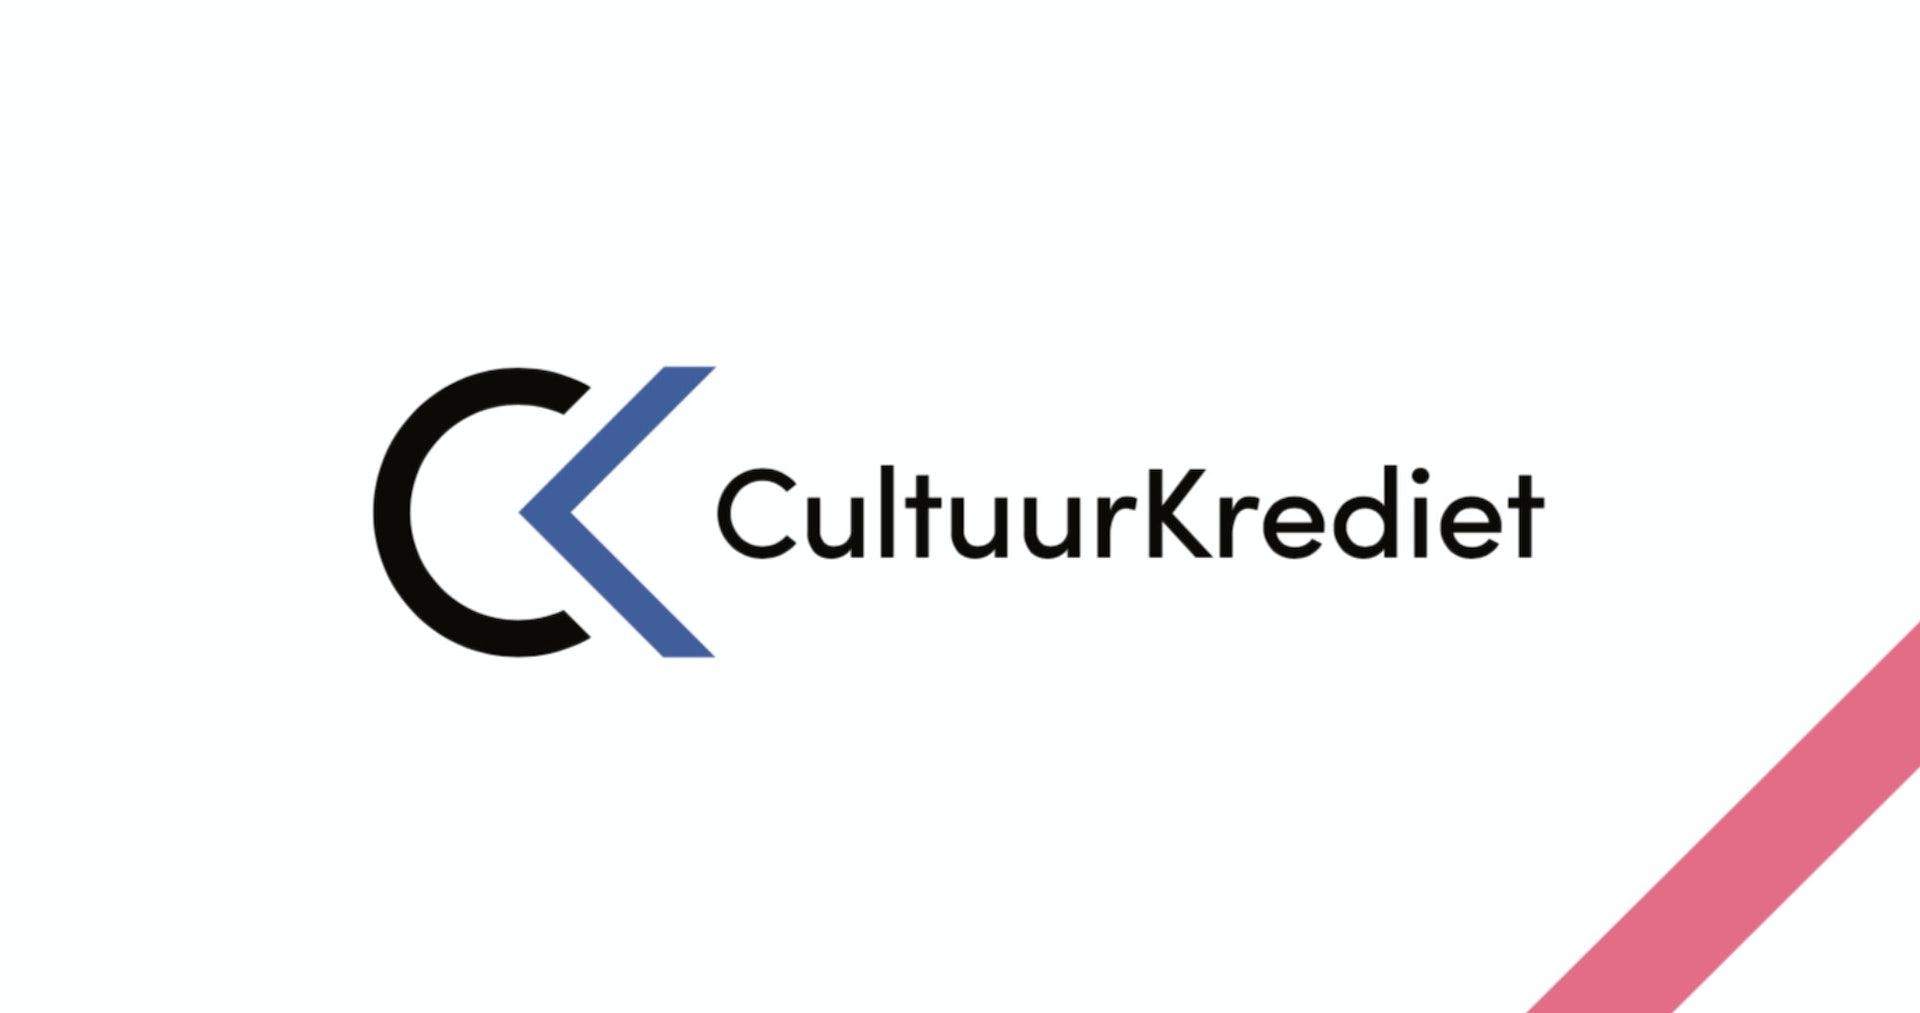 Cultuurkrediet